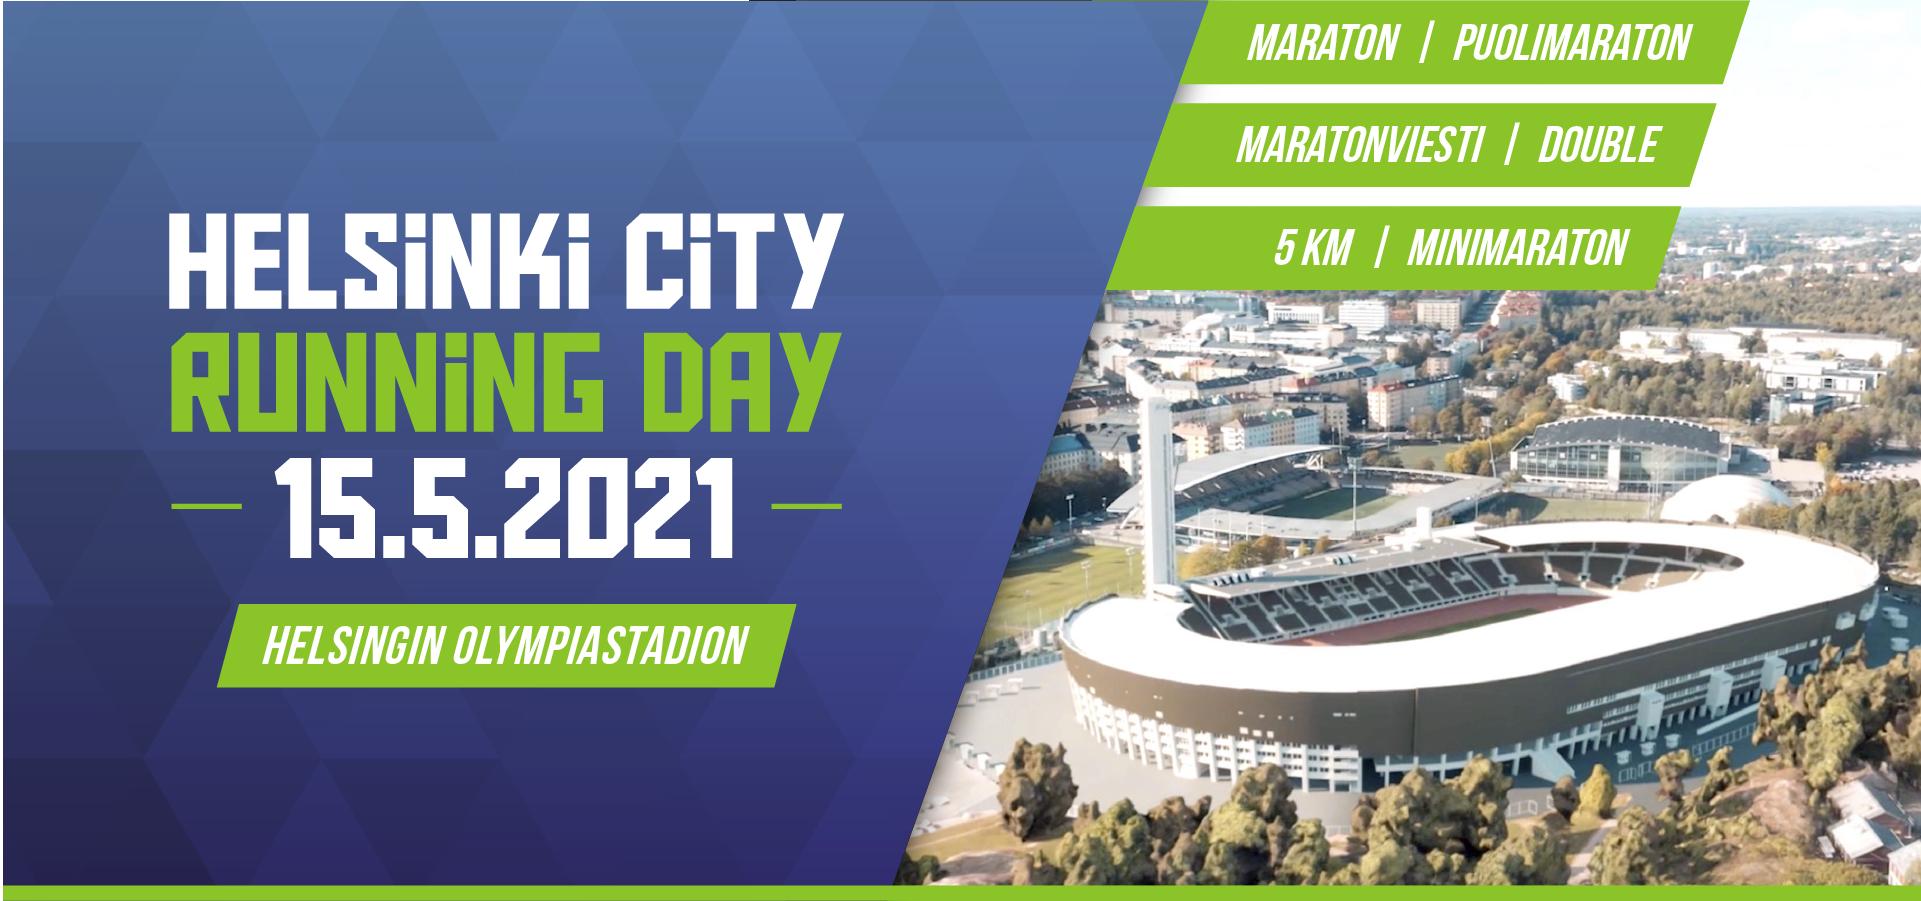 Helsinki City Running Day juoksutapahtuma 2021